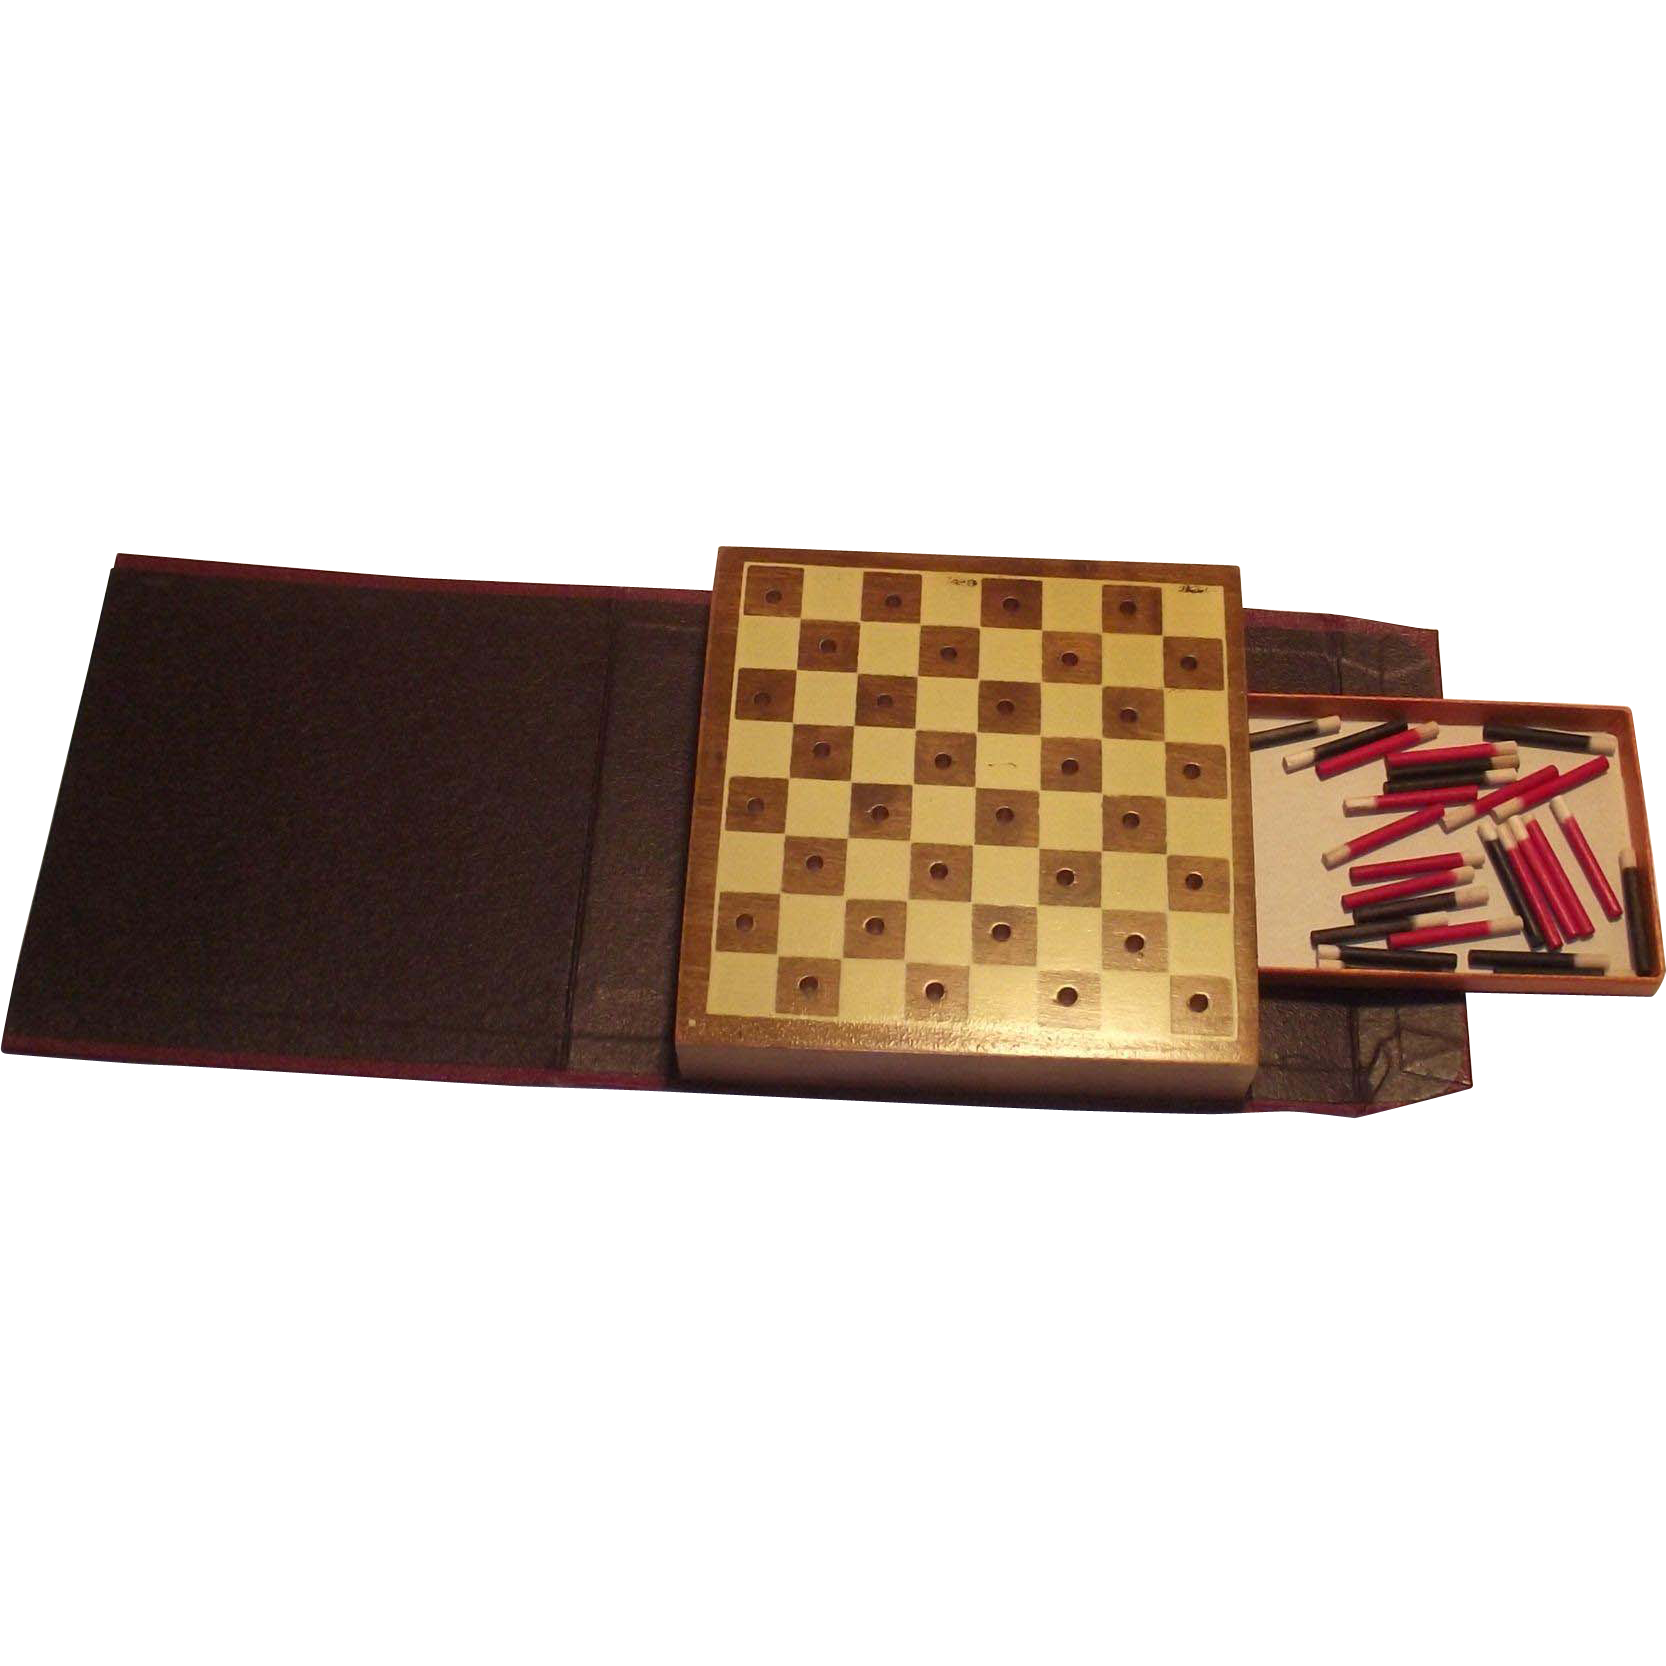 Vintage Drueke Travel Checkerboard with Pegs Leather Look Book